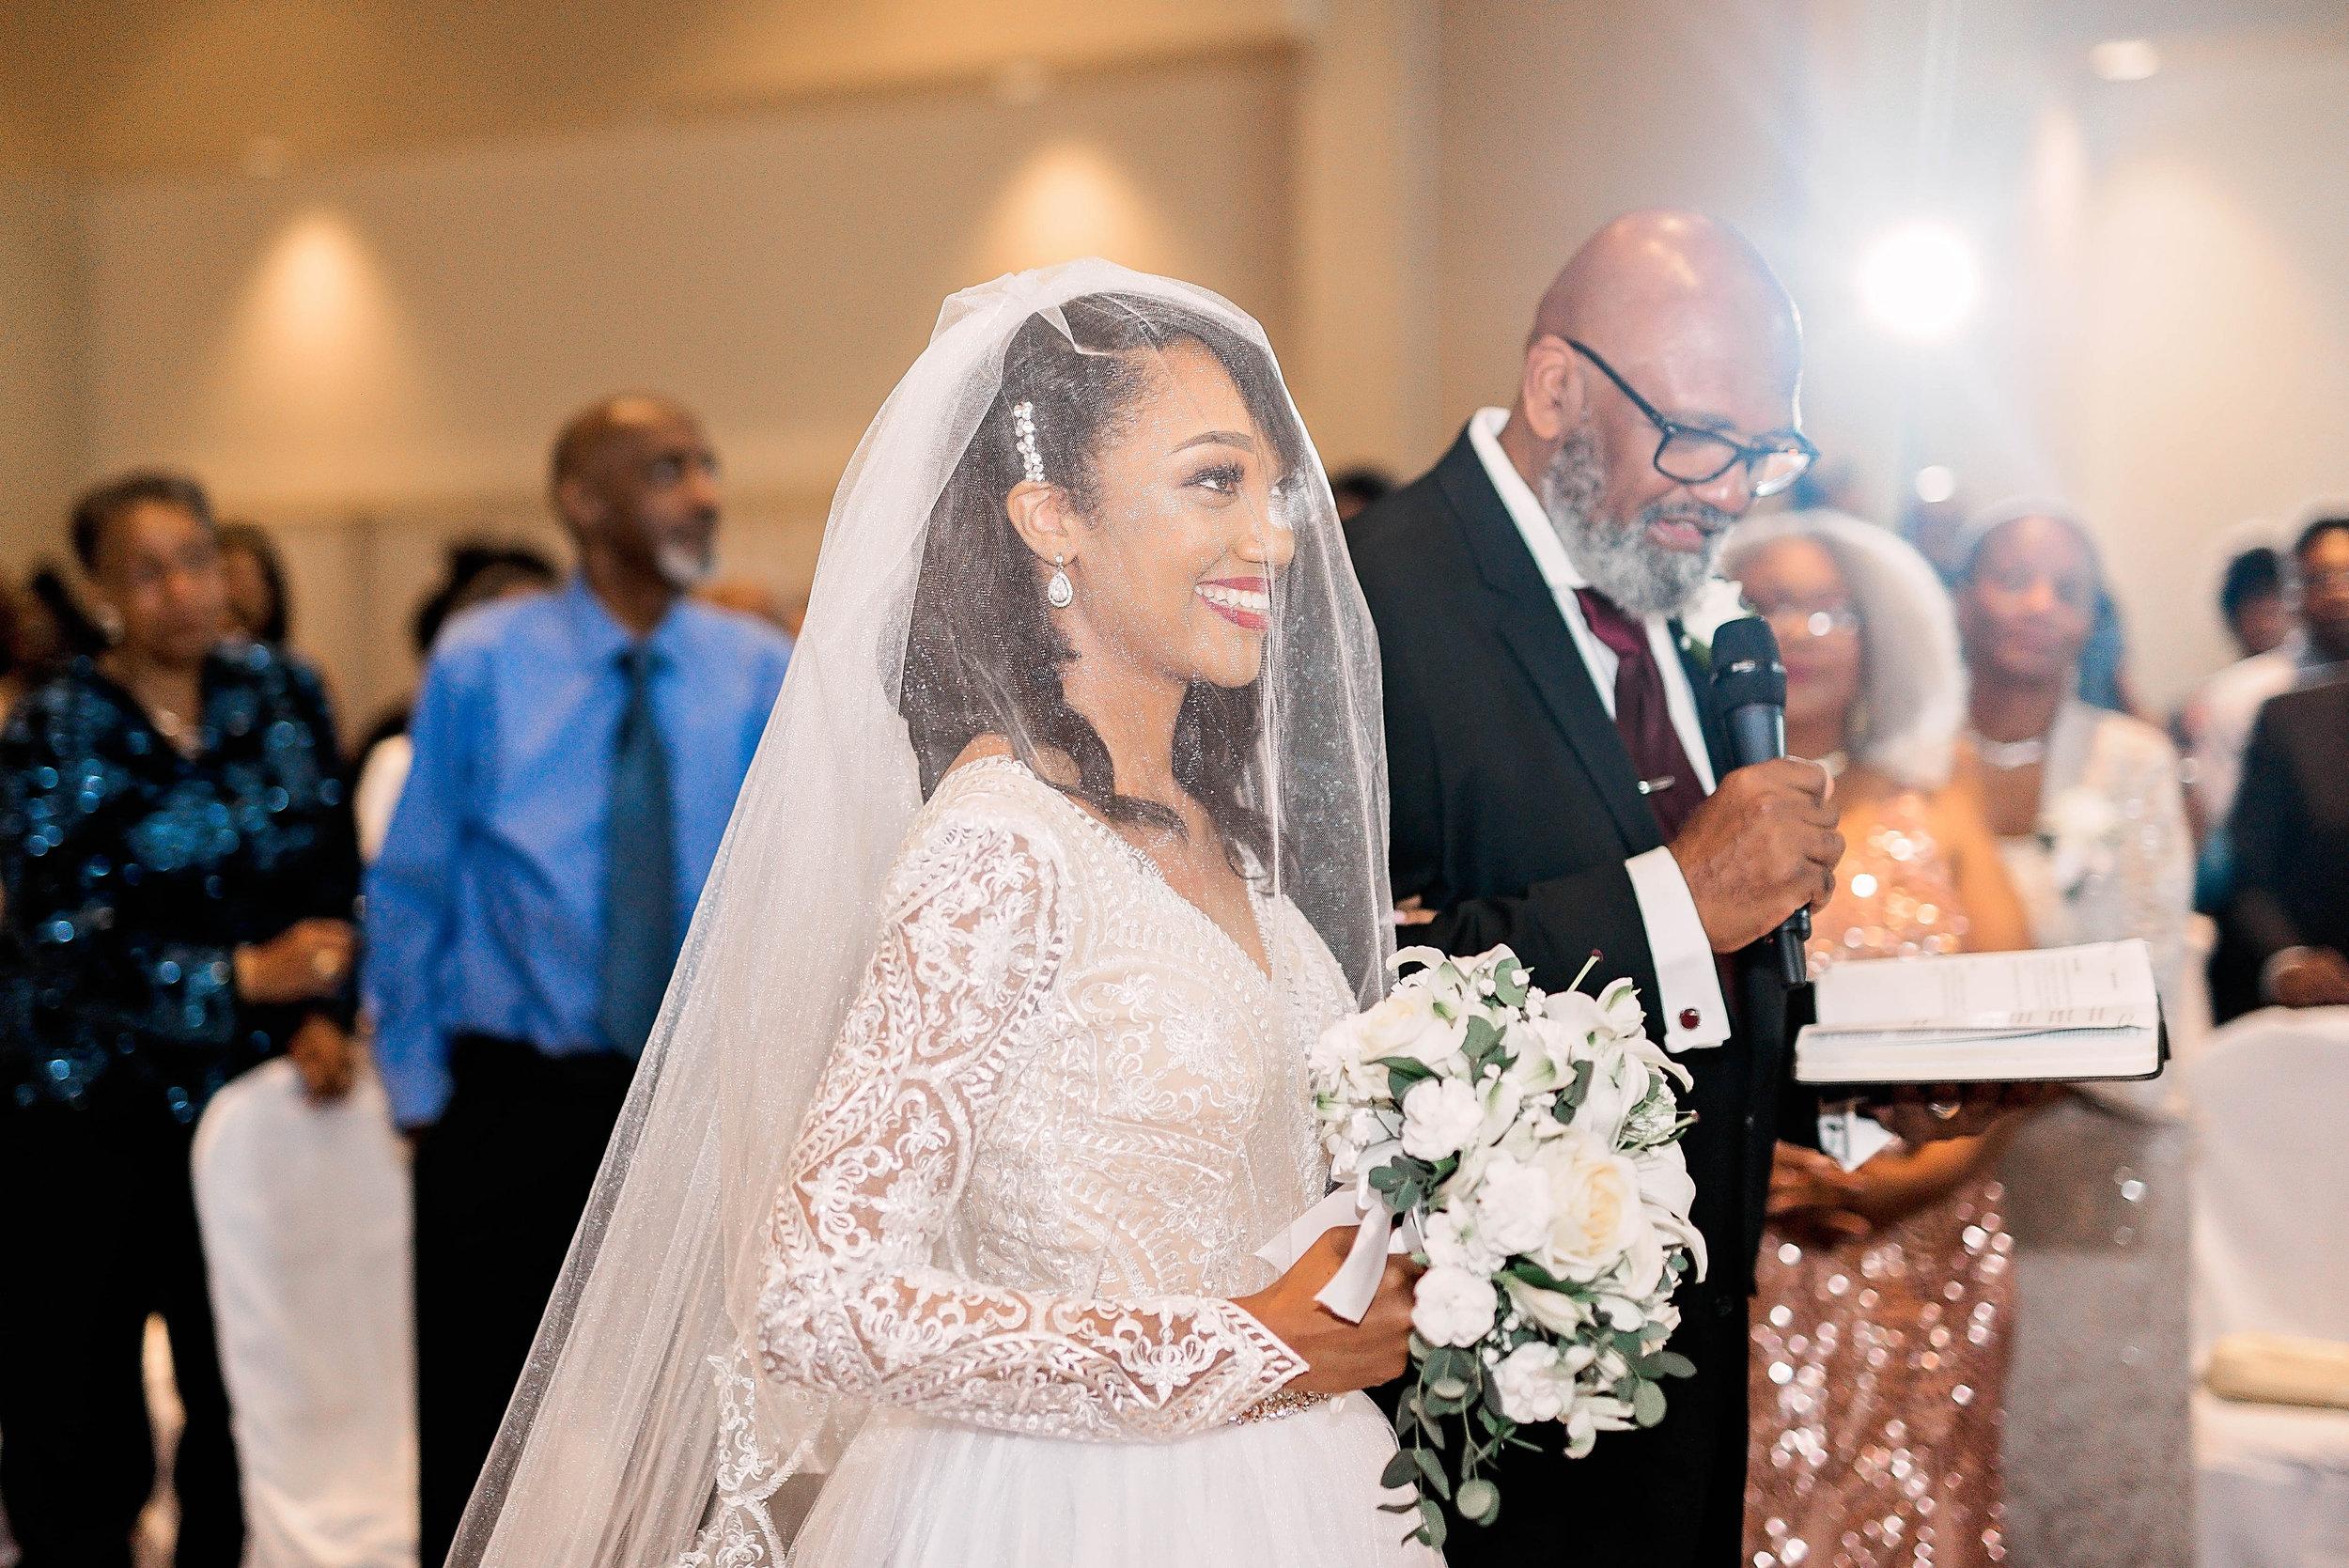 Dallas Wedding- Pharris Photography- Ceremony- Kaimyn + Ezra- The Altar